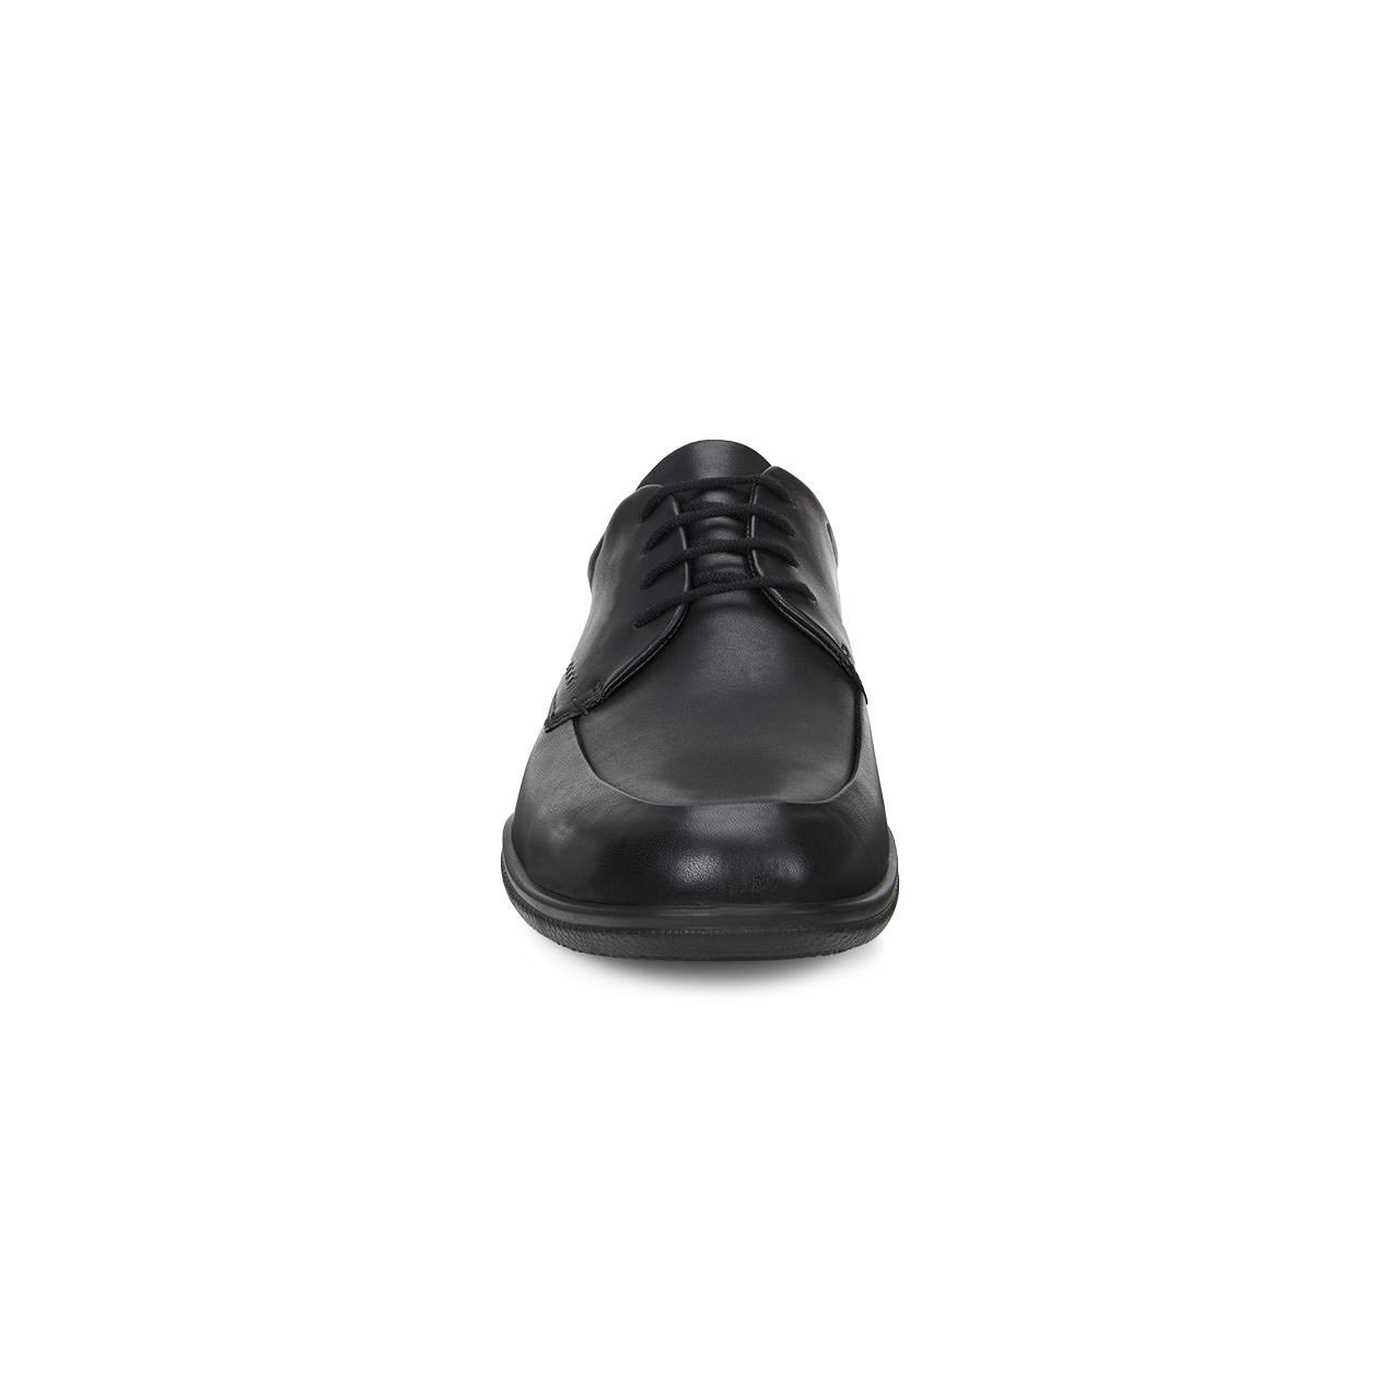 ECCO GRENOBLE Shoe